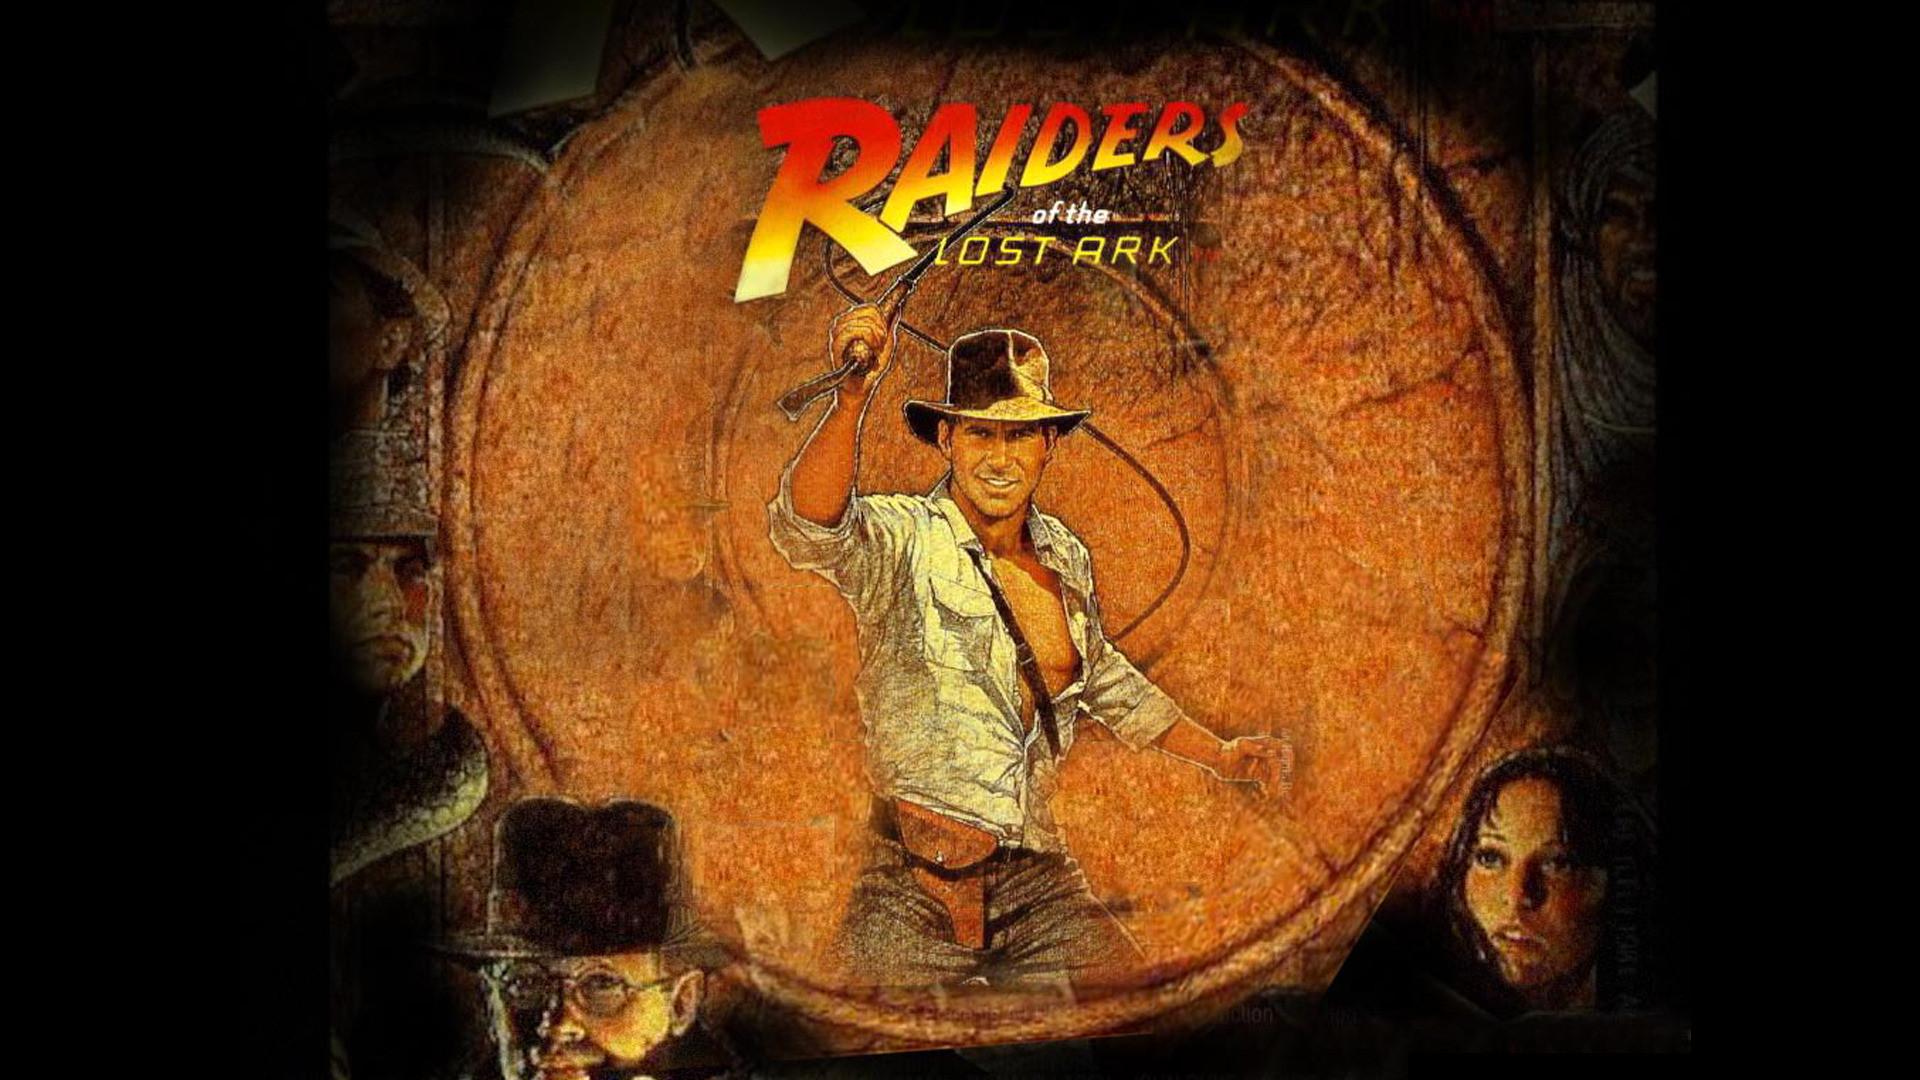 INDIANA JONES RAIDERS LOST ARK action adventure poster r wallpaper 1920x1080